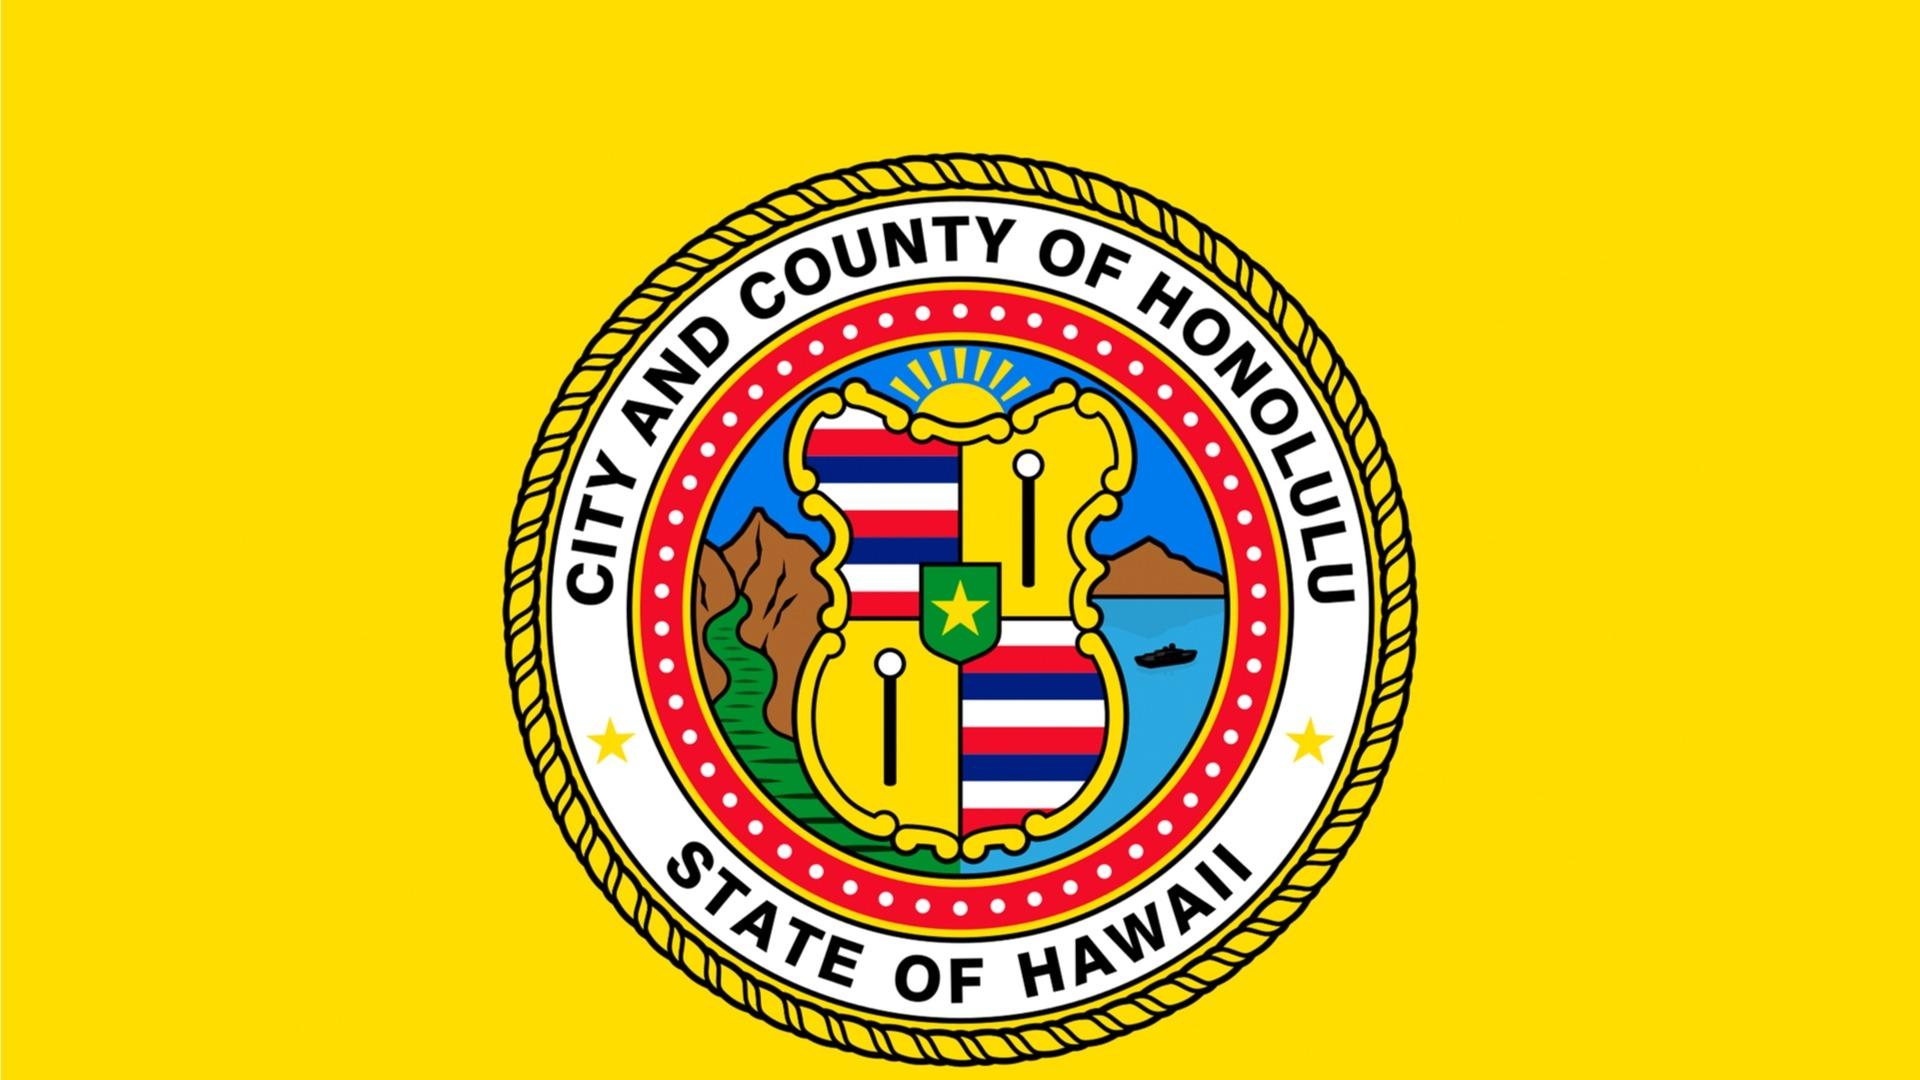 Honolulu City Seal